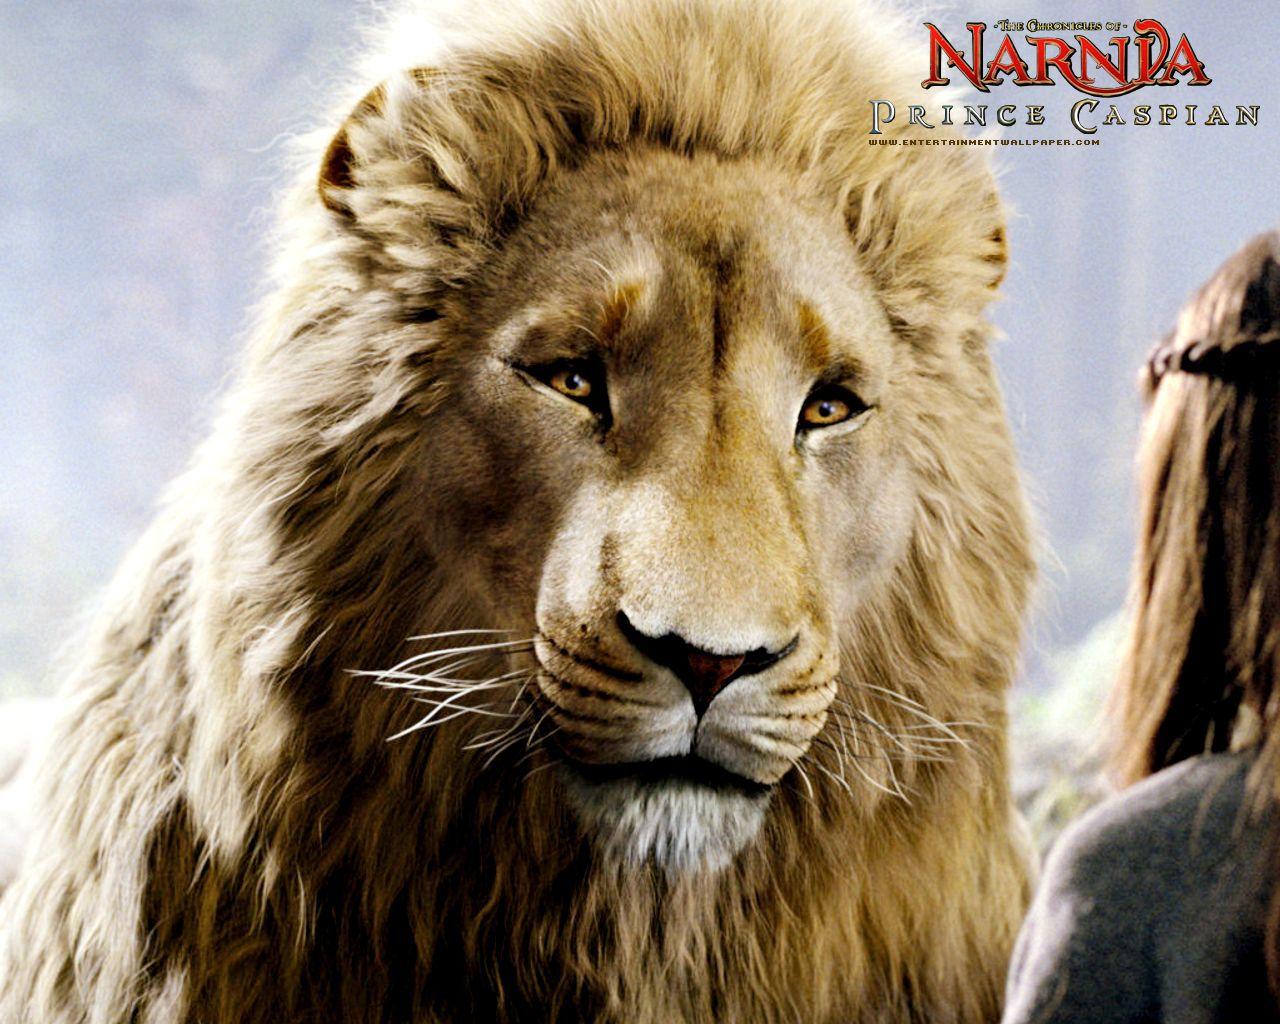 Aslan And Prince Caspian From Chronicles Of Narnia Desktop Wallpaper